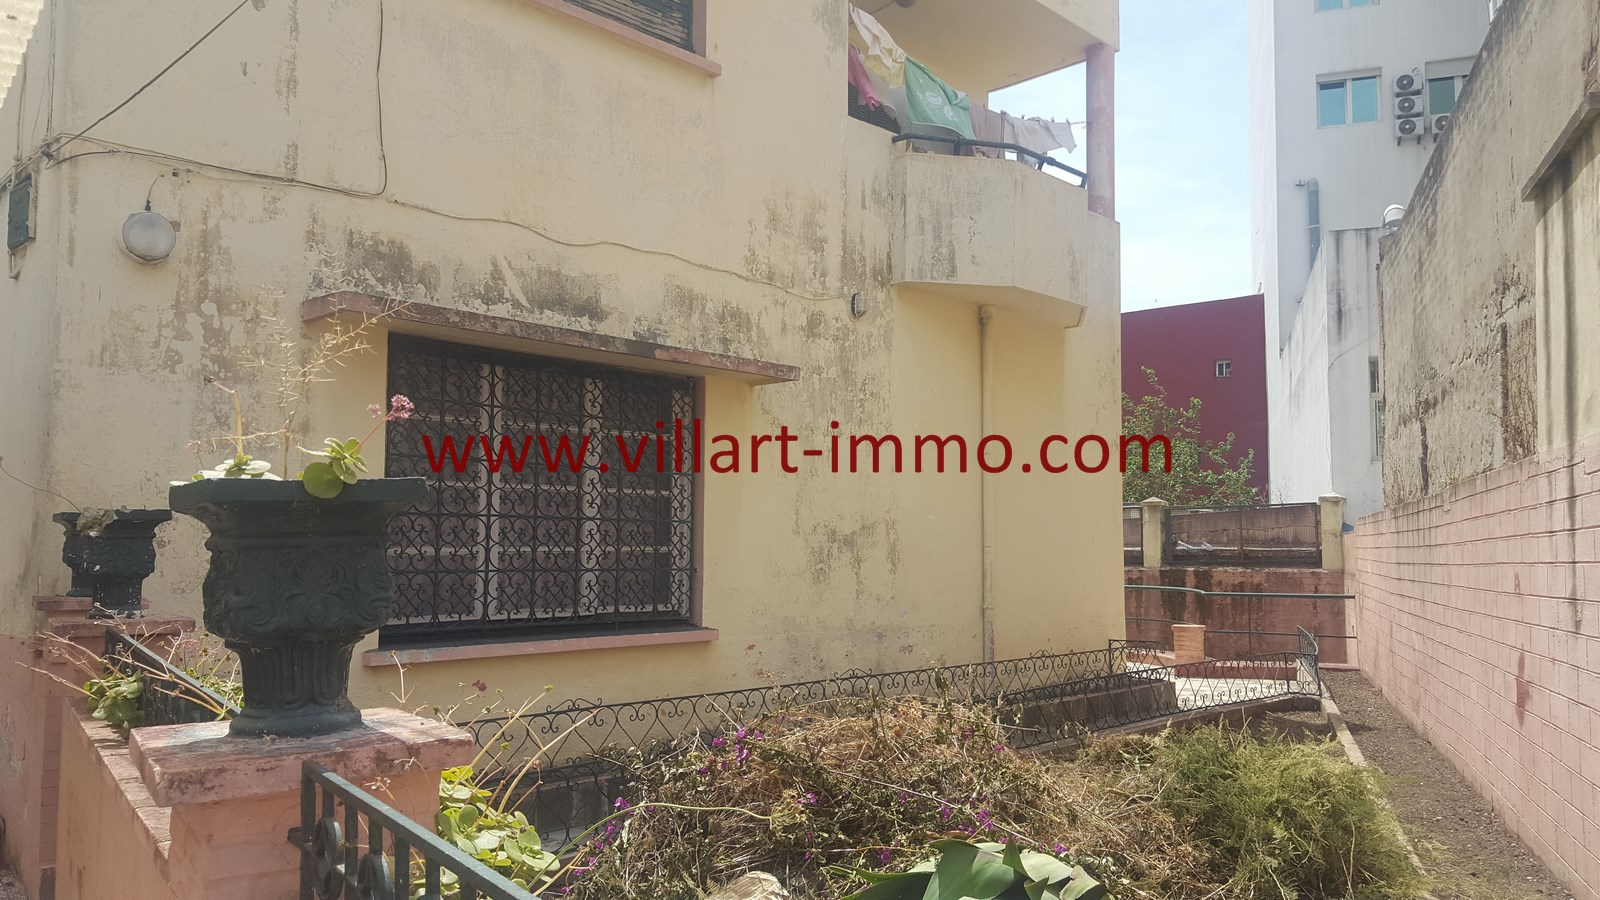 2-Vente-Maison-Tanger-Centre Ville-Jardin 1-VM499-Villart Immo